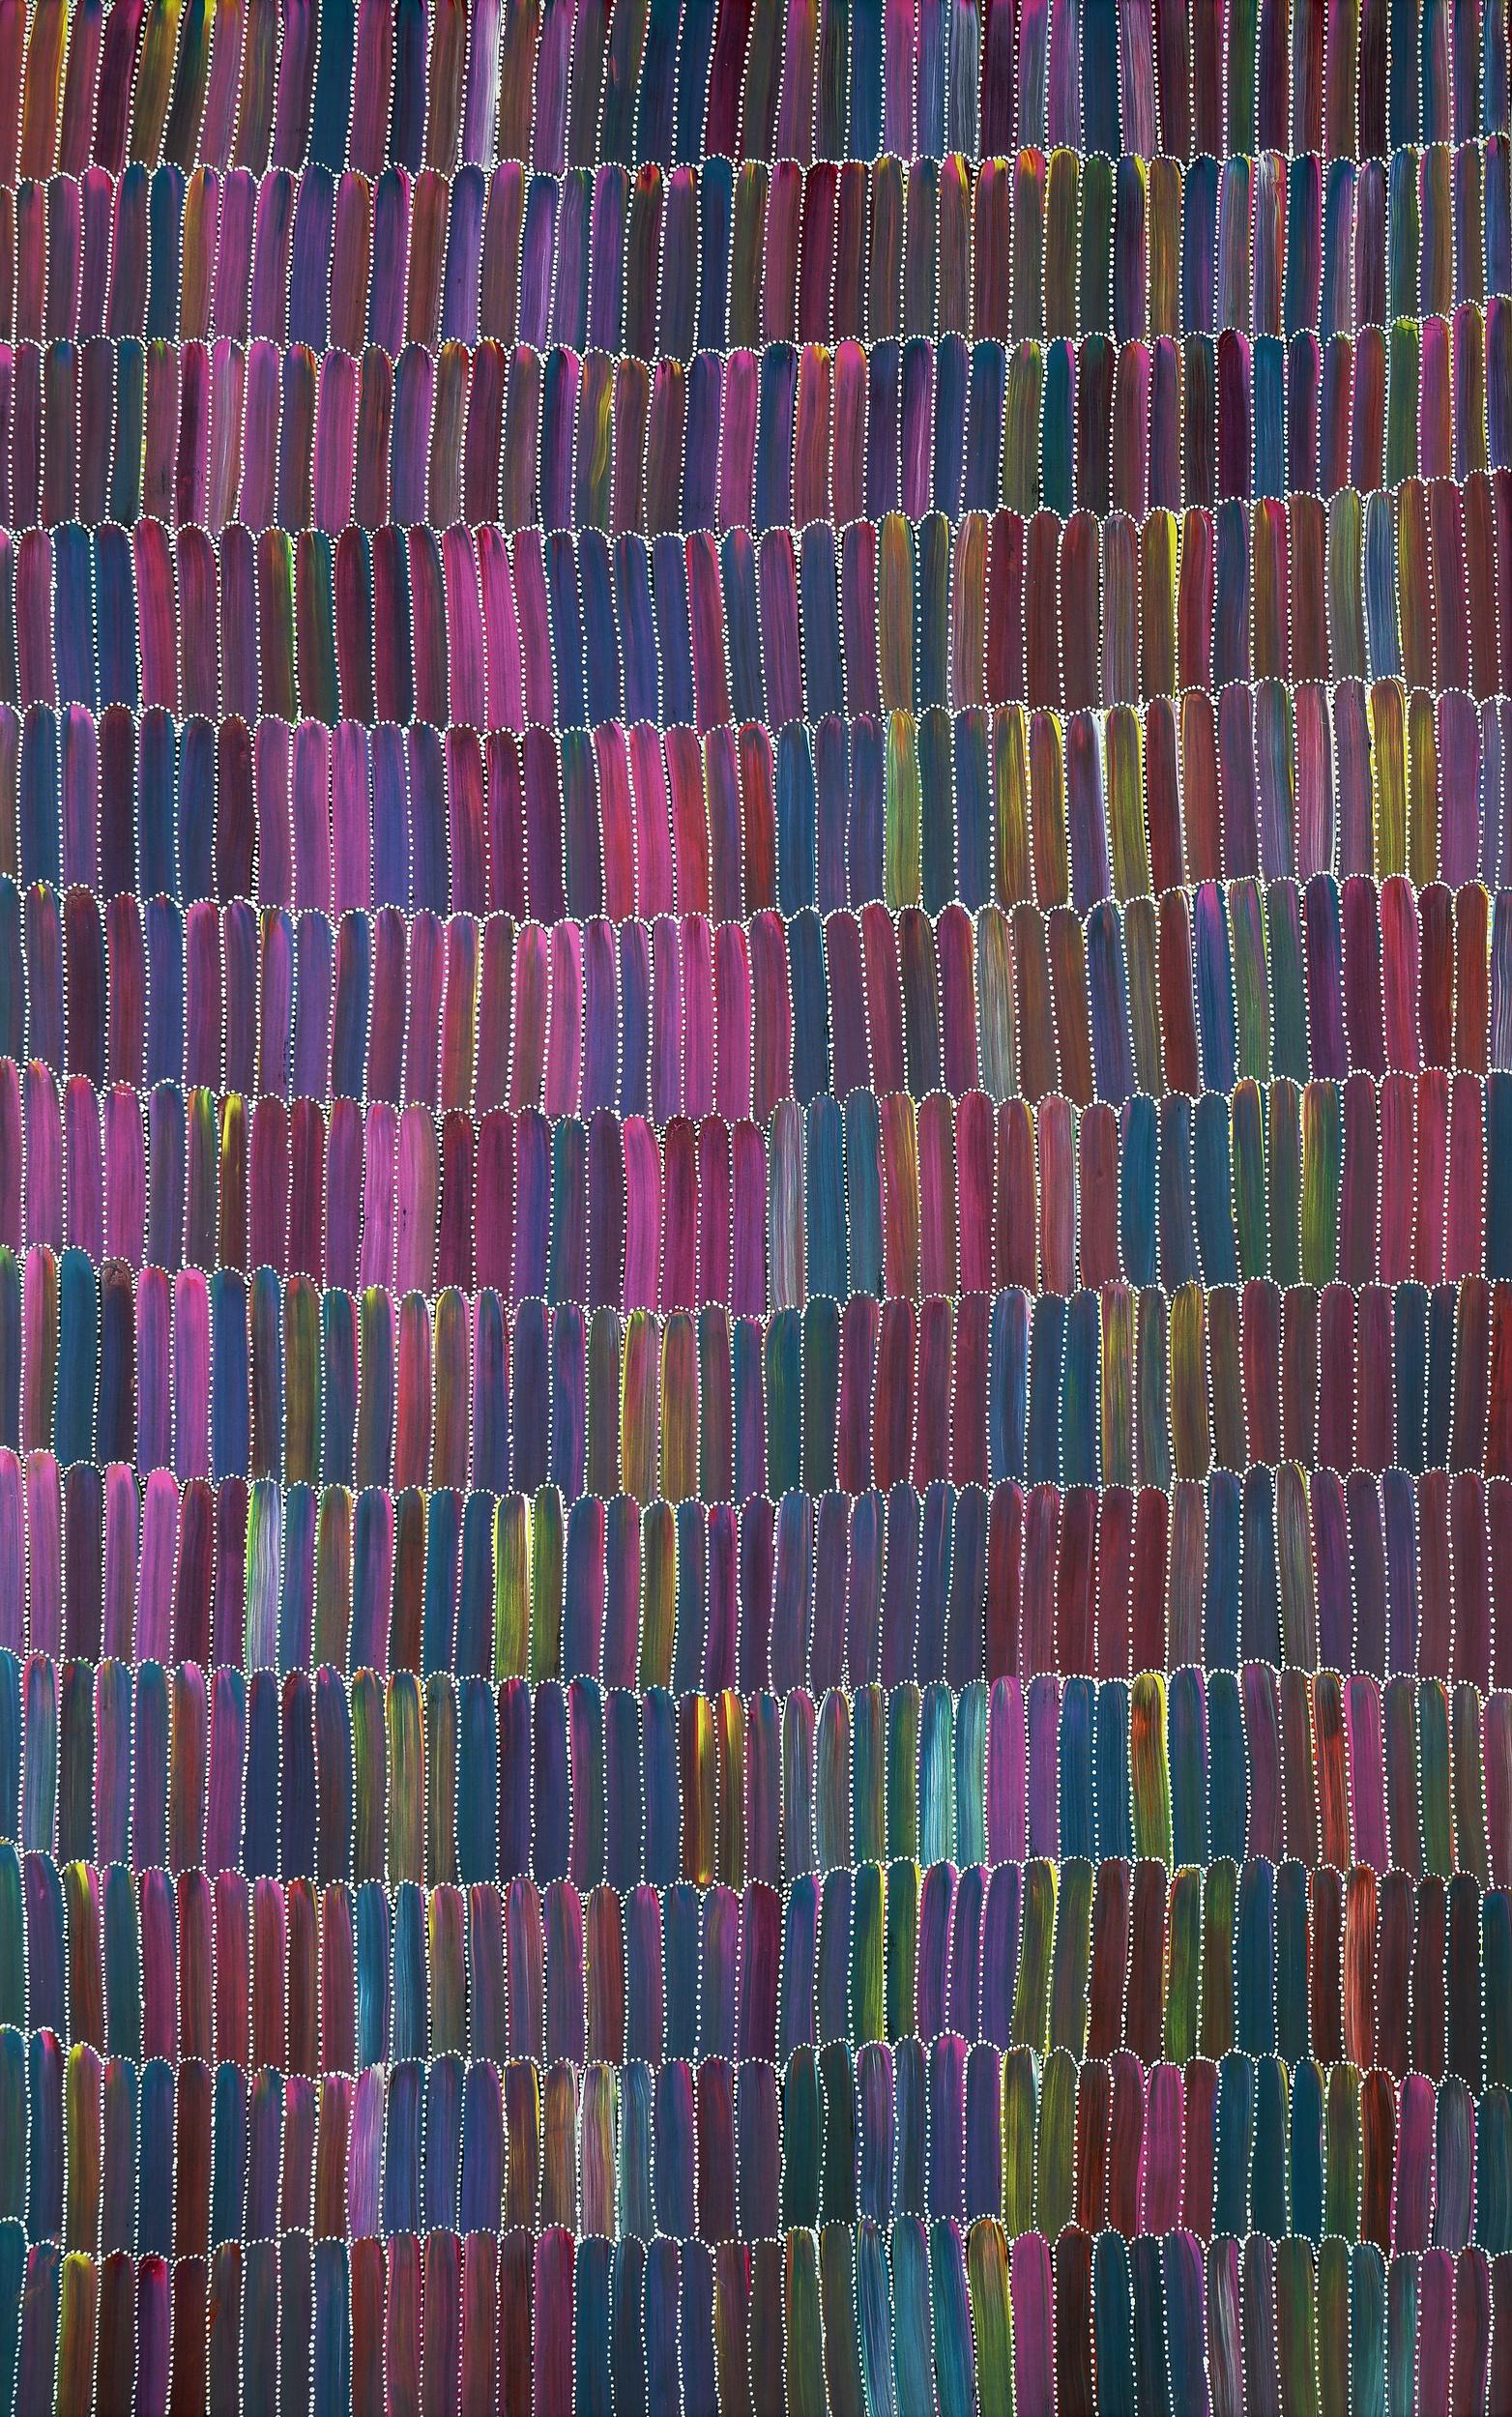 'Jeannie Mills Pwerle (born 1965), Bush Potatoes 2020, Synthetic Polymer Paint on Canvas, 152 x 95 cm'